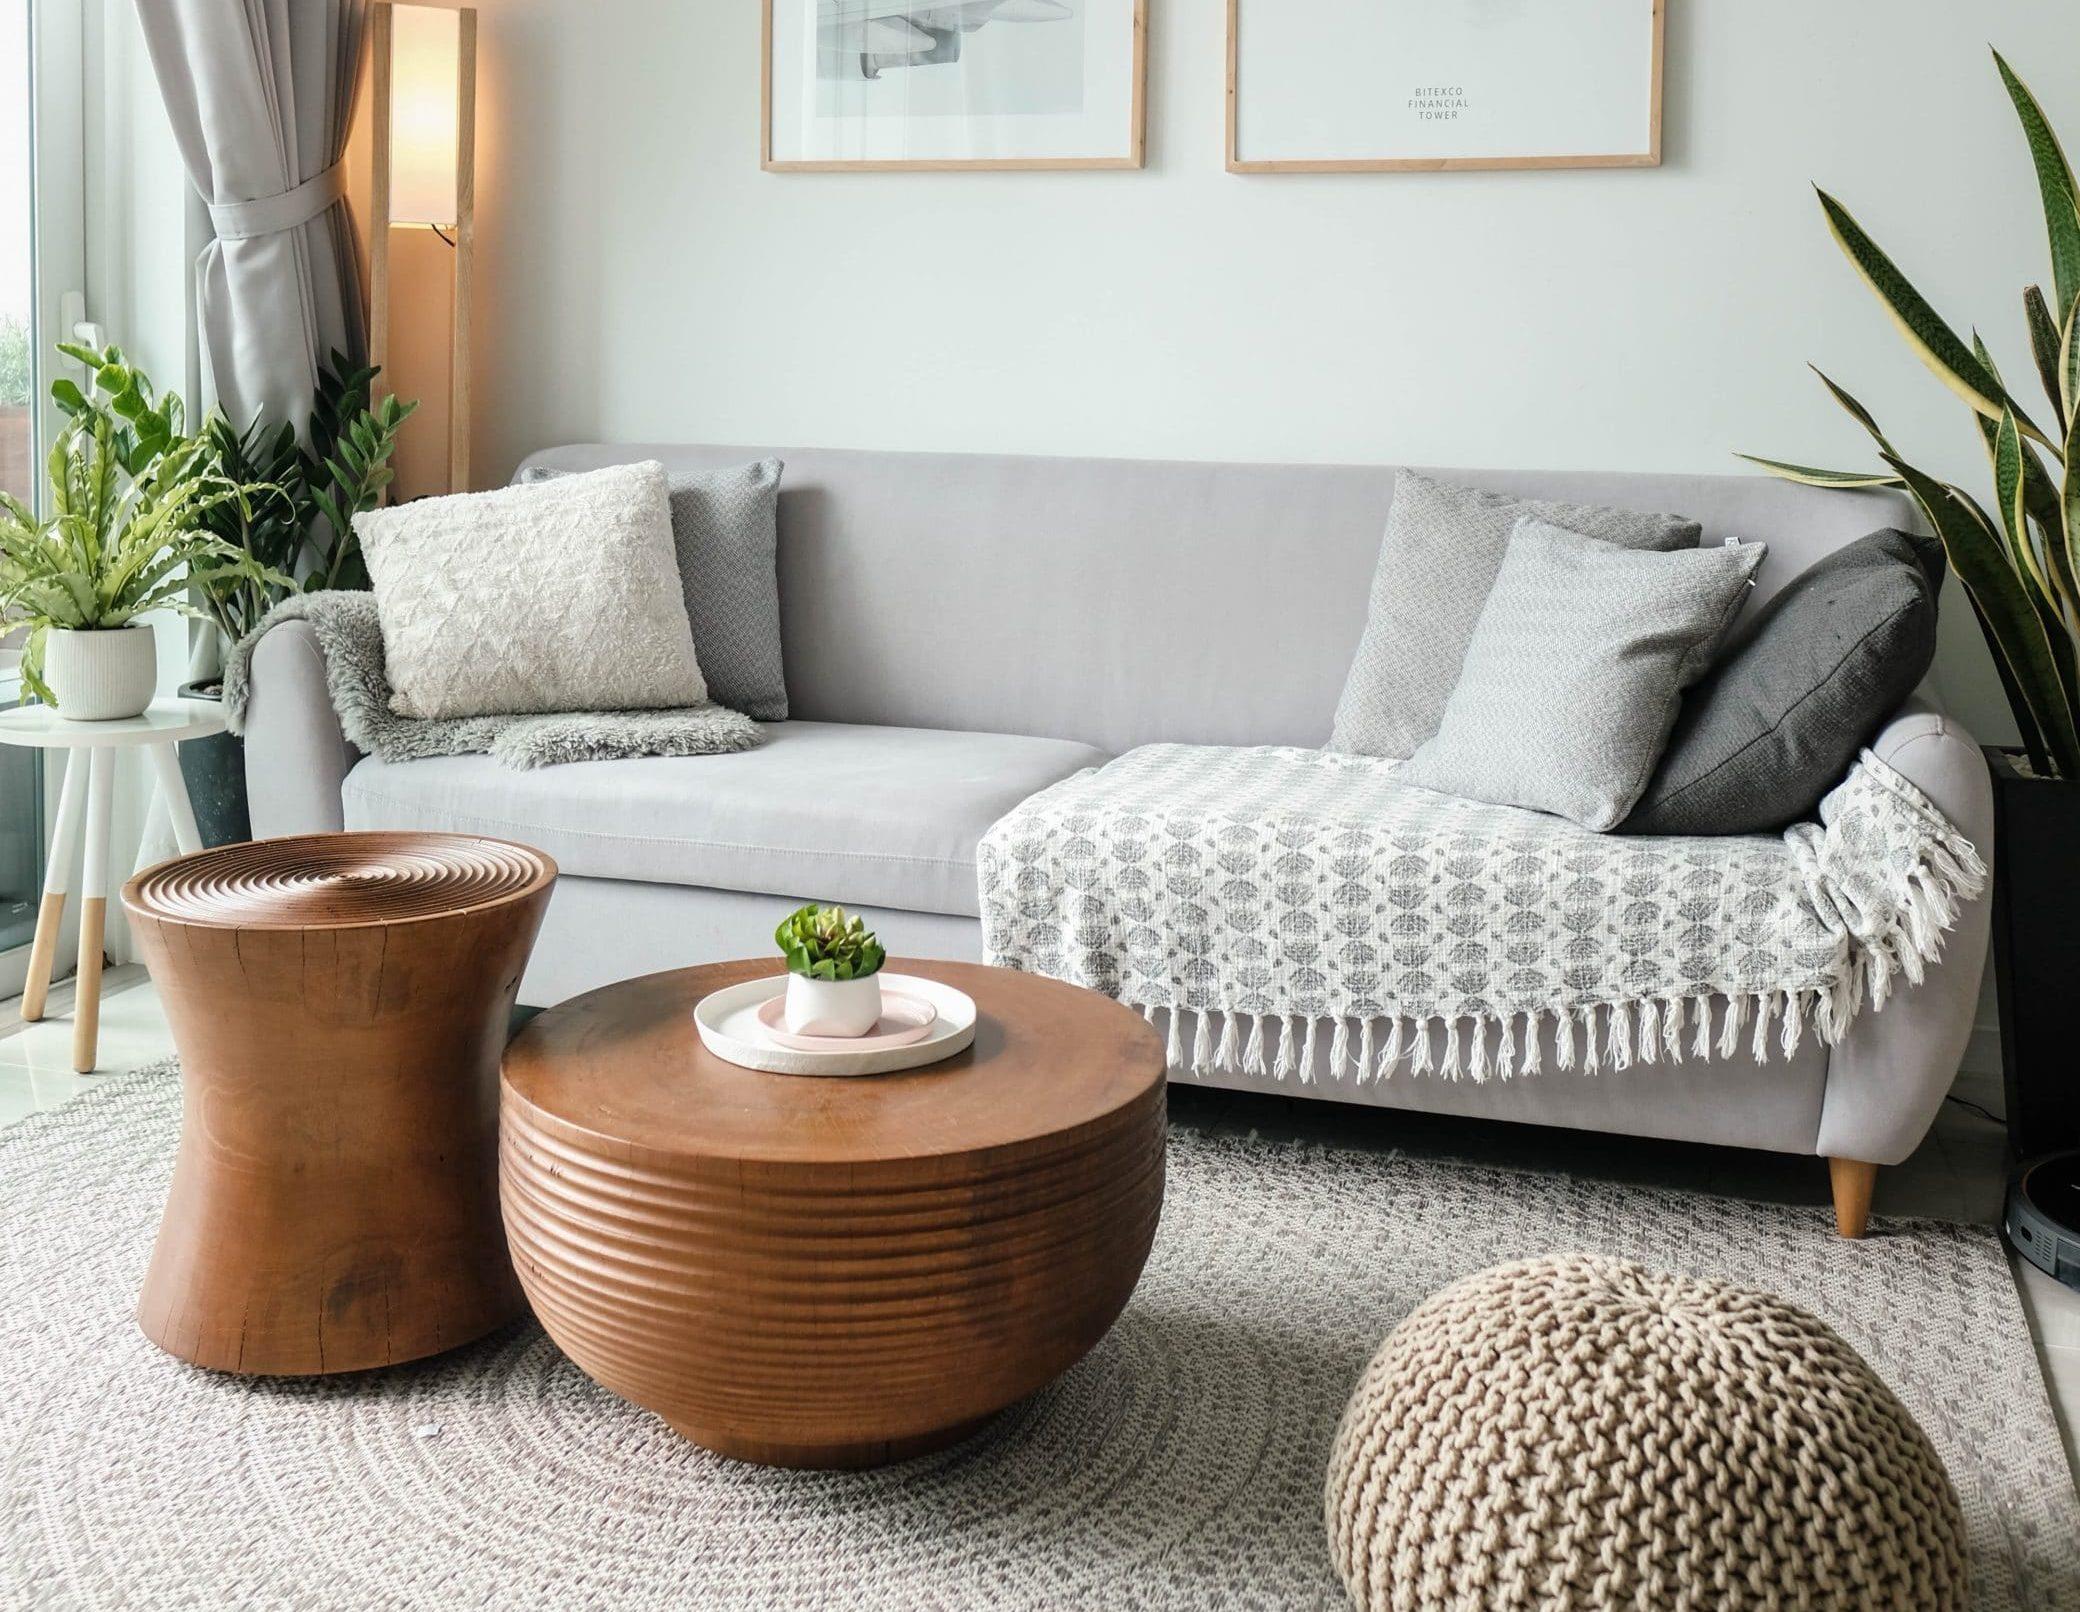 Interior Design Instagram Accounts For Decor Inspiration